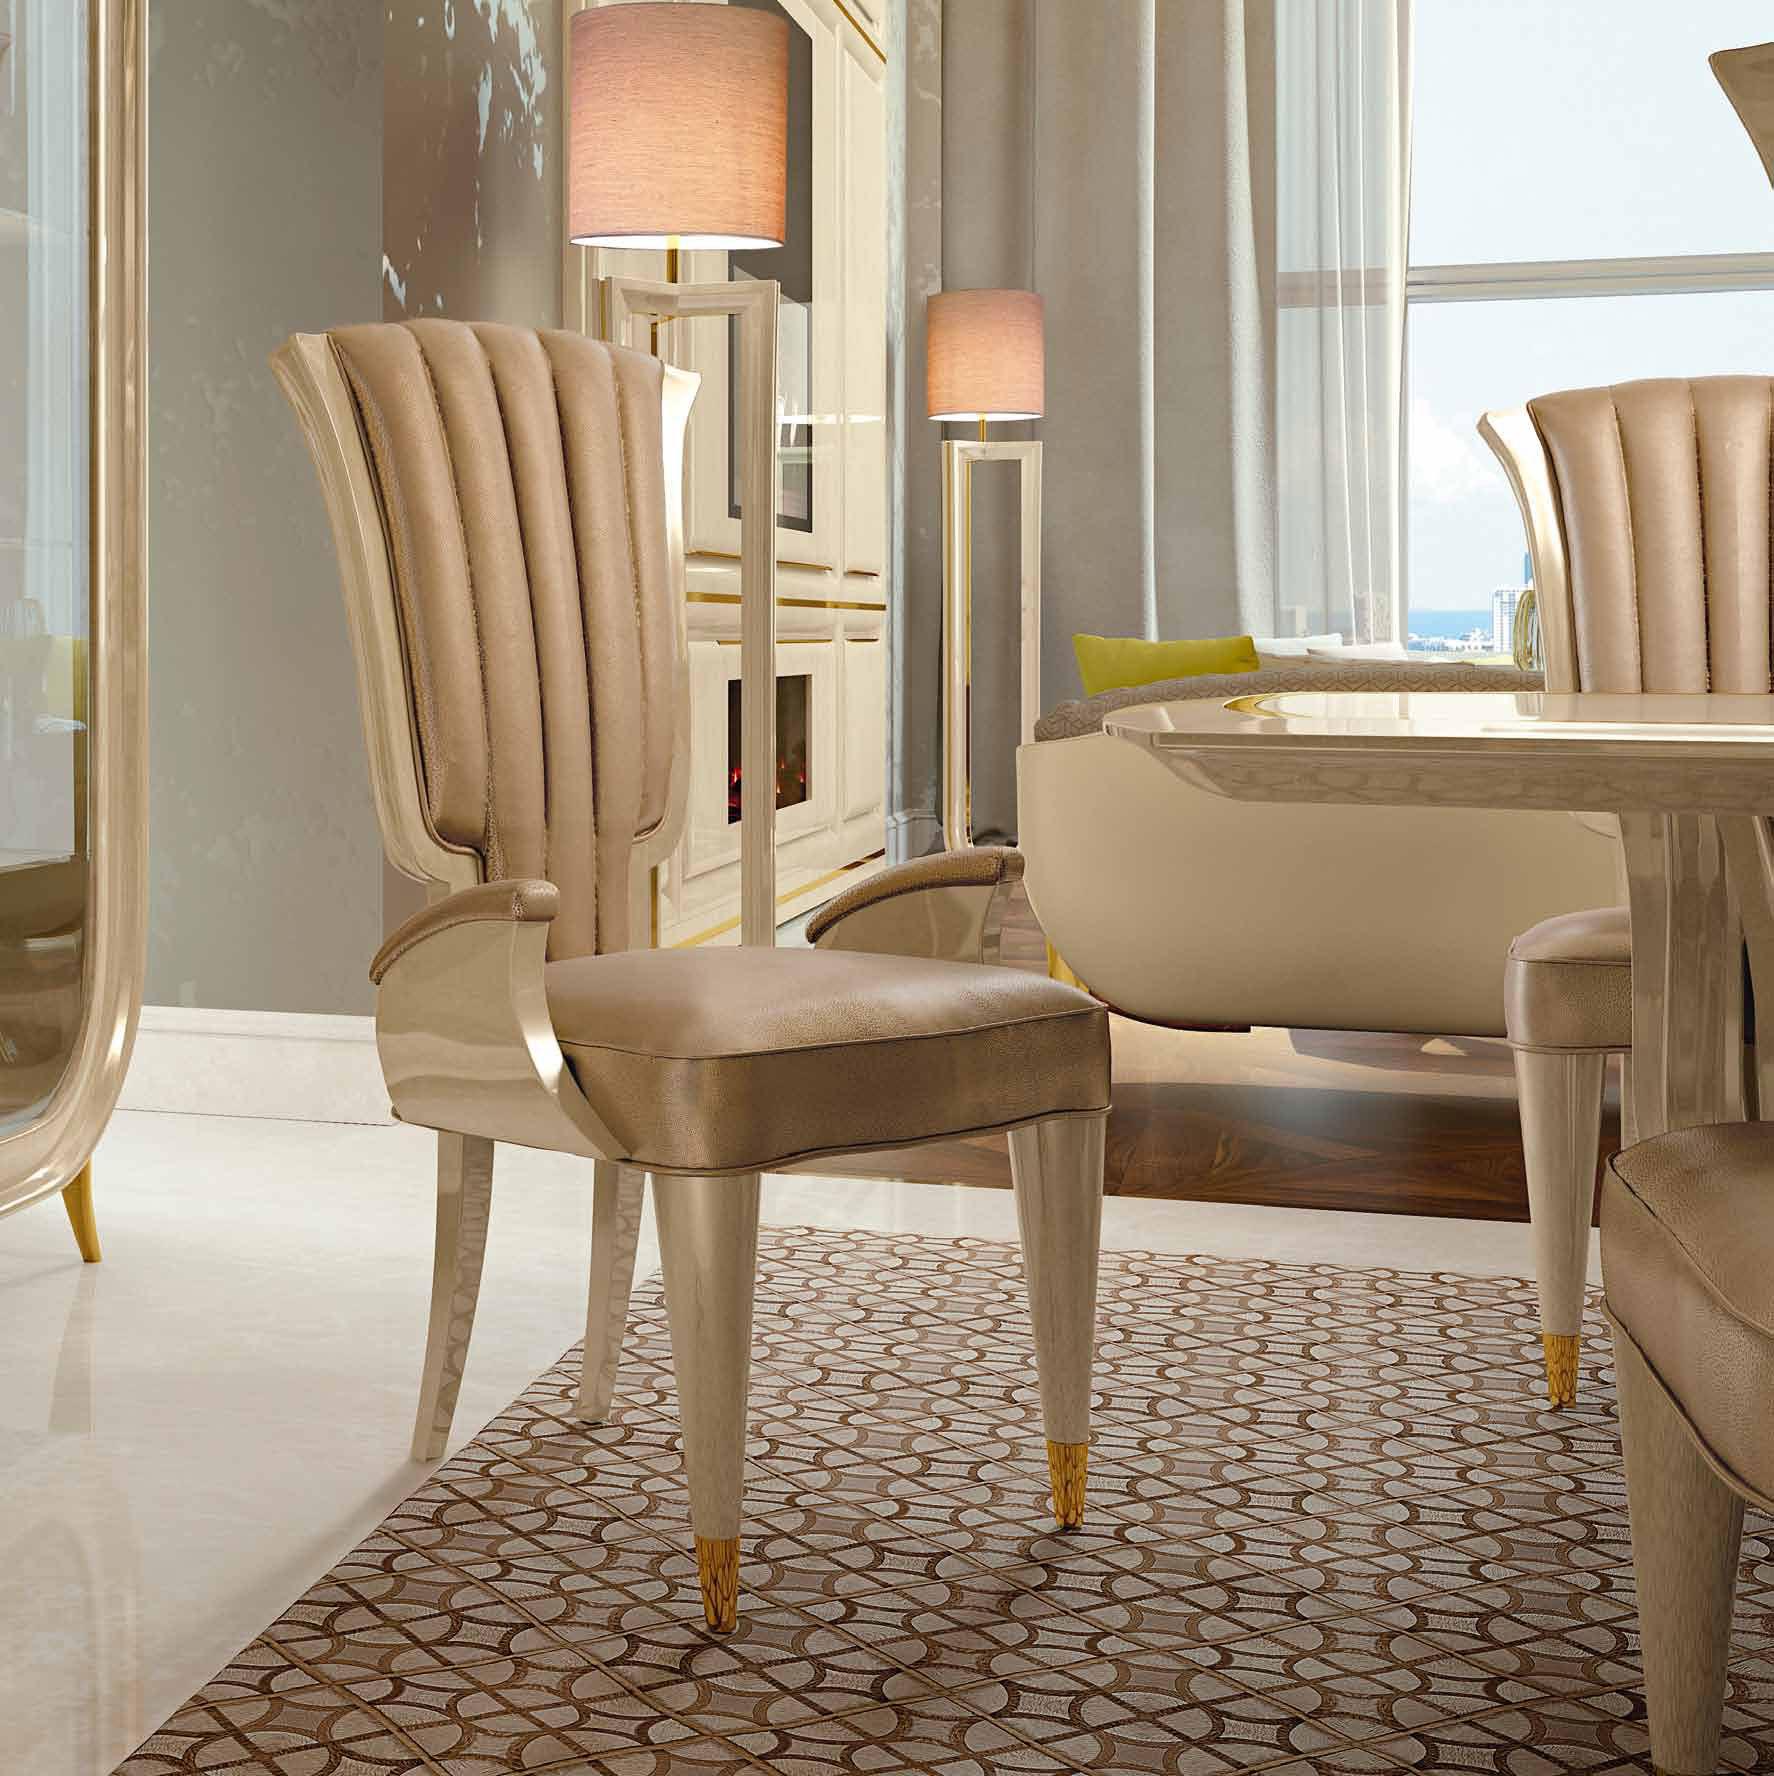 fauteuil contemporain de luxe paris - Luminaire Salle A Manger Contemporain2192